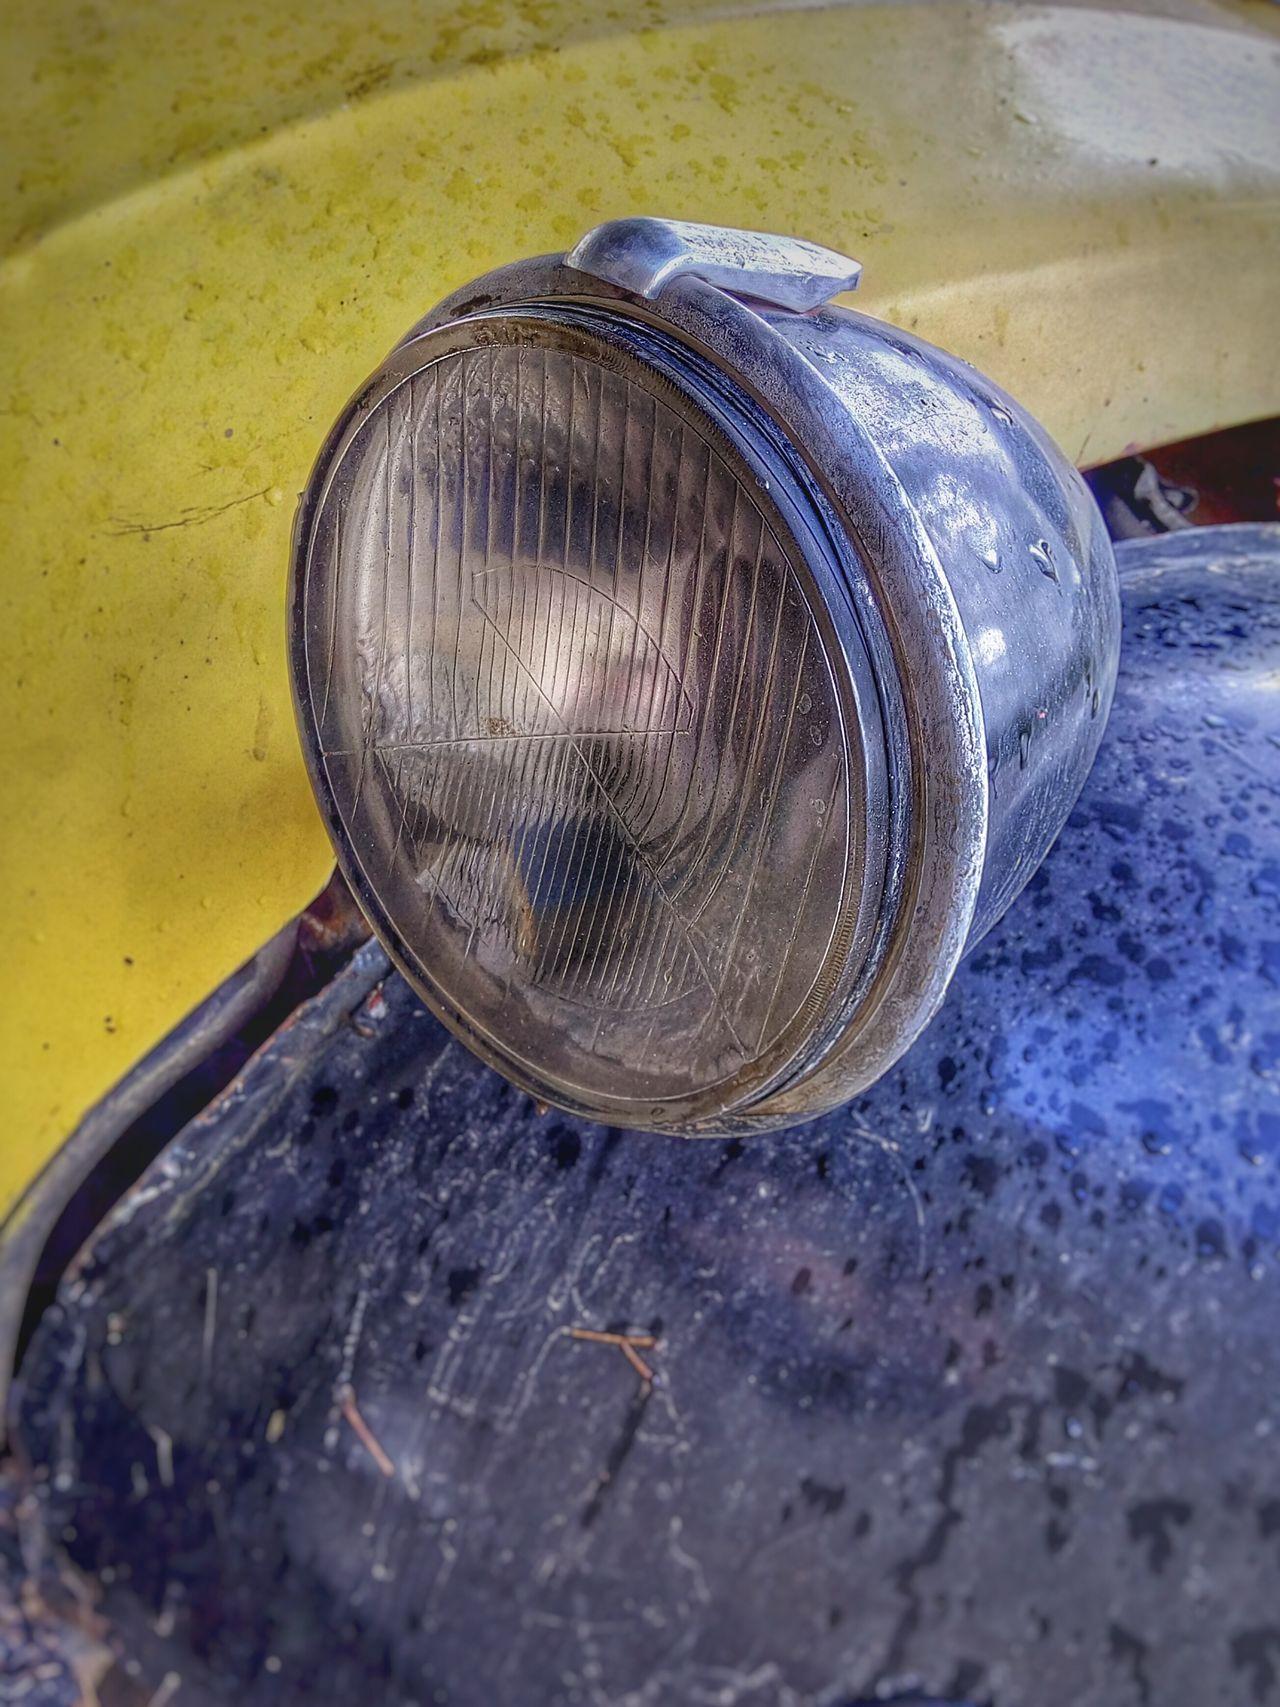 Car Light Lamp Oldtimer Vintage Cars Retrica Retro Retro Car Carlight Yellow Blue Citroen 2cv Citroen Glass Glasses Glass - Material Reflector Car Porn Old Old Car Oldtimer Love Chrome Chrome Light Chrome And Glass